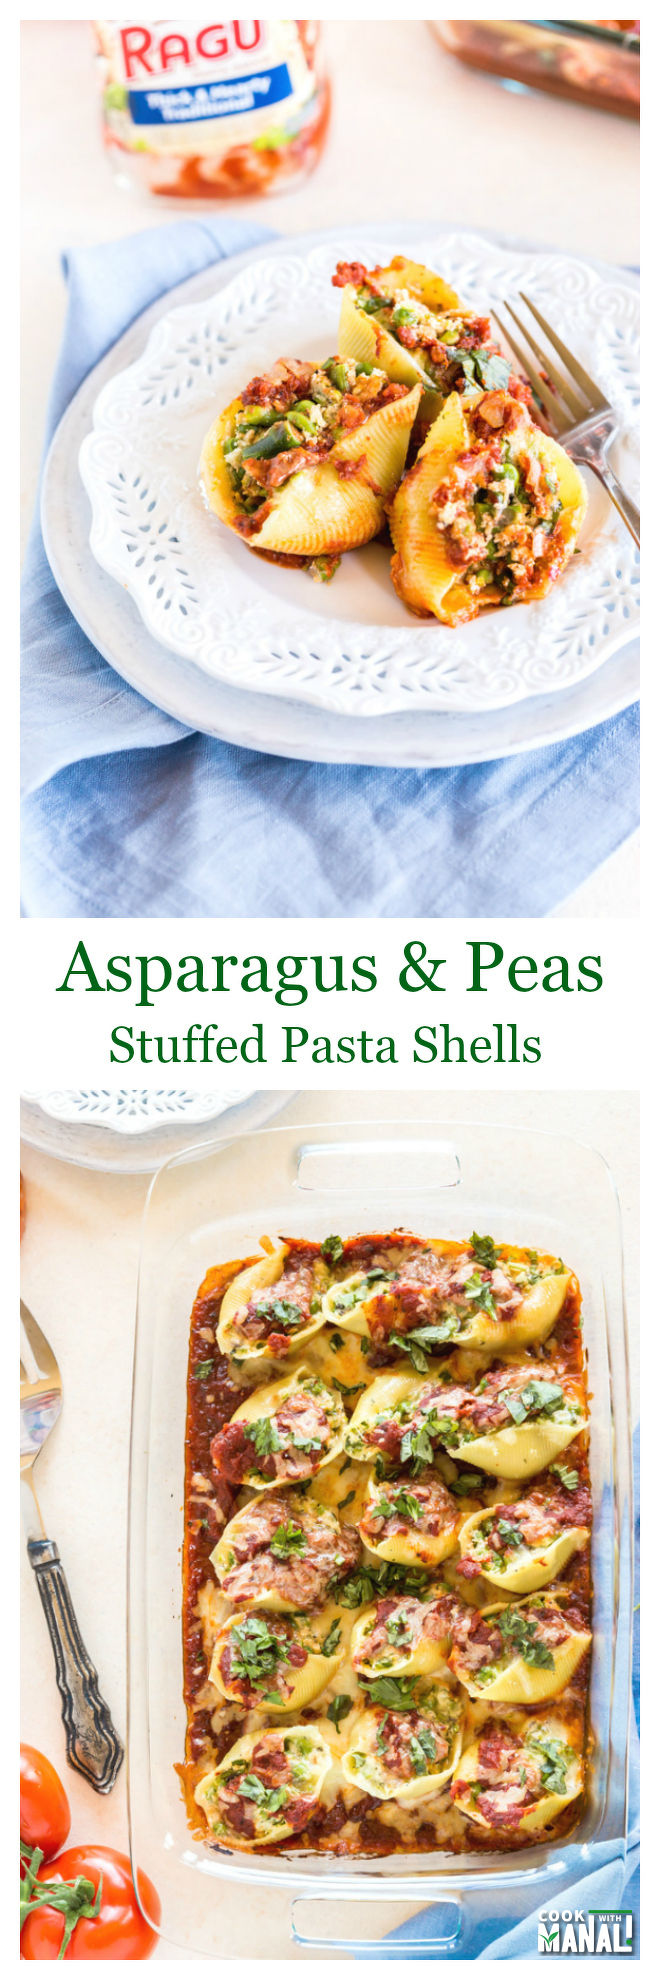 Peas Asparagus Stuffed Pasta Shells Collage